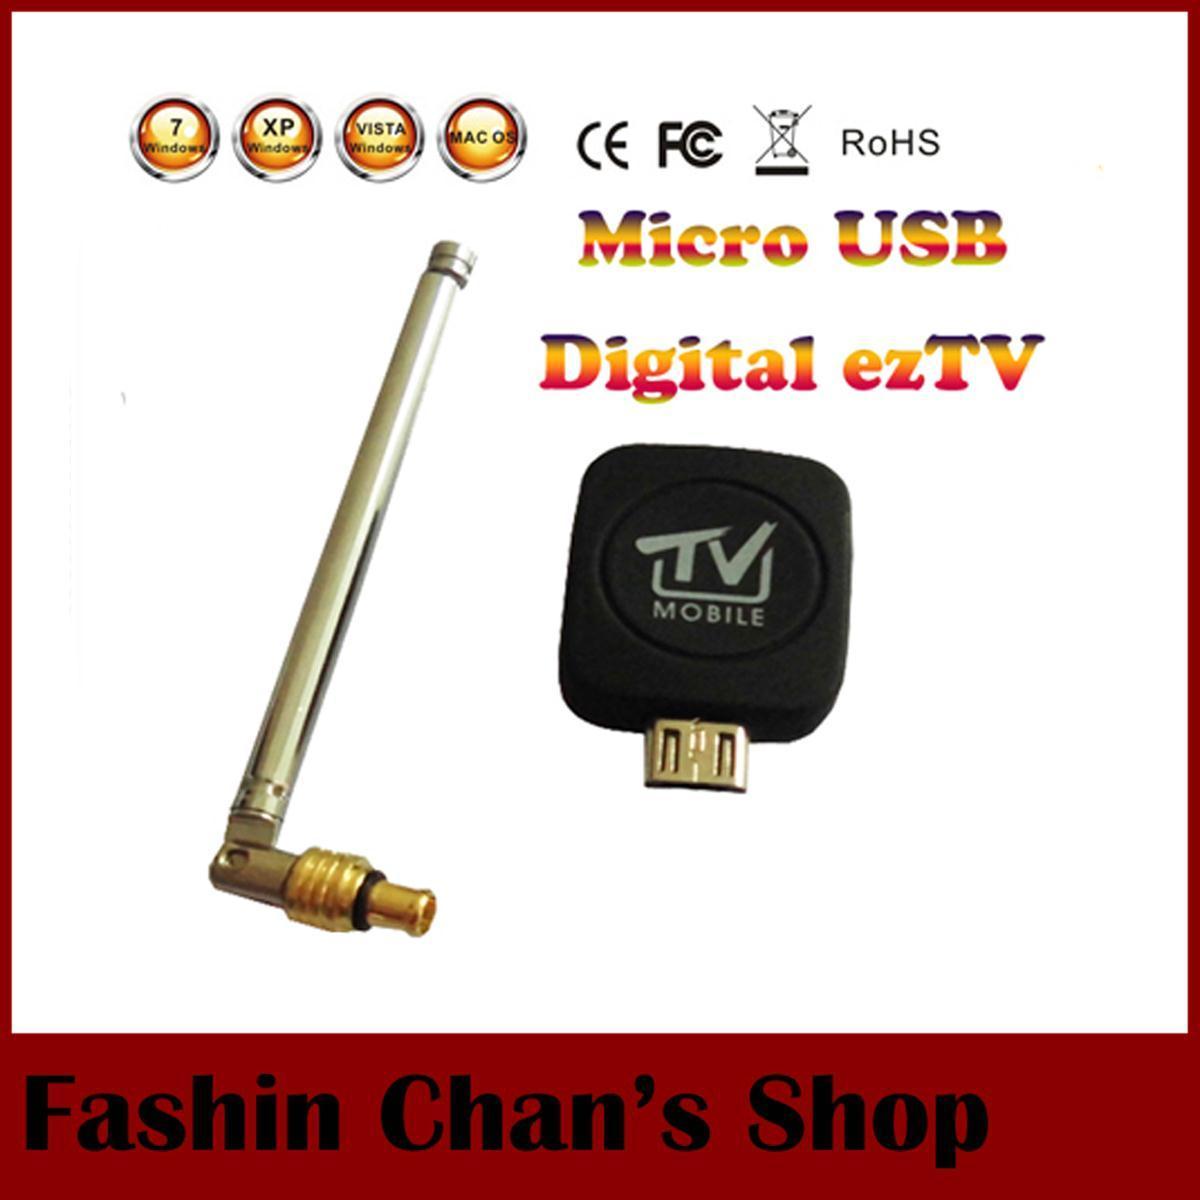 Super Mini Micro USB DVB-T ISDB-T Digital Mobile Streamer ez TV Tuner Receiver Stick for Android/Phone/Ipad table,Freeshipping(China (Mainland))